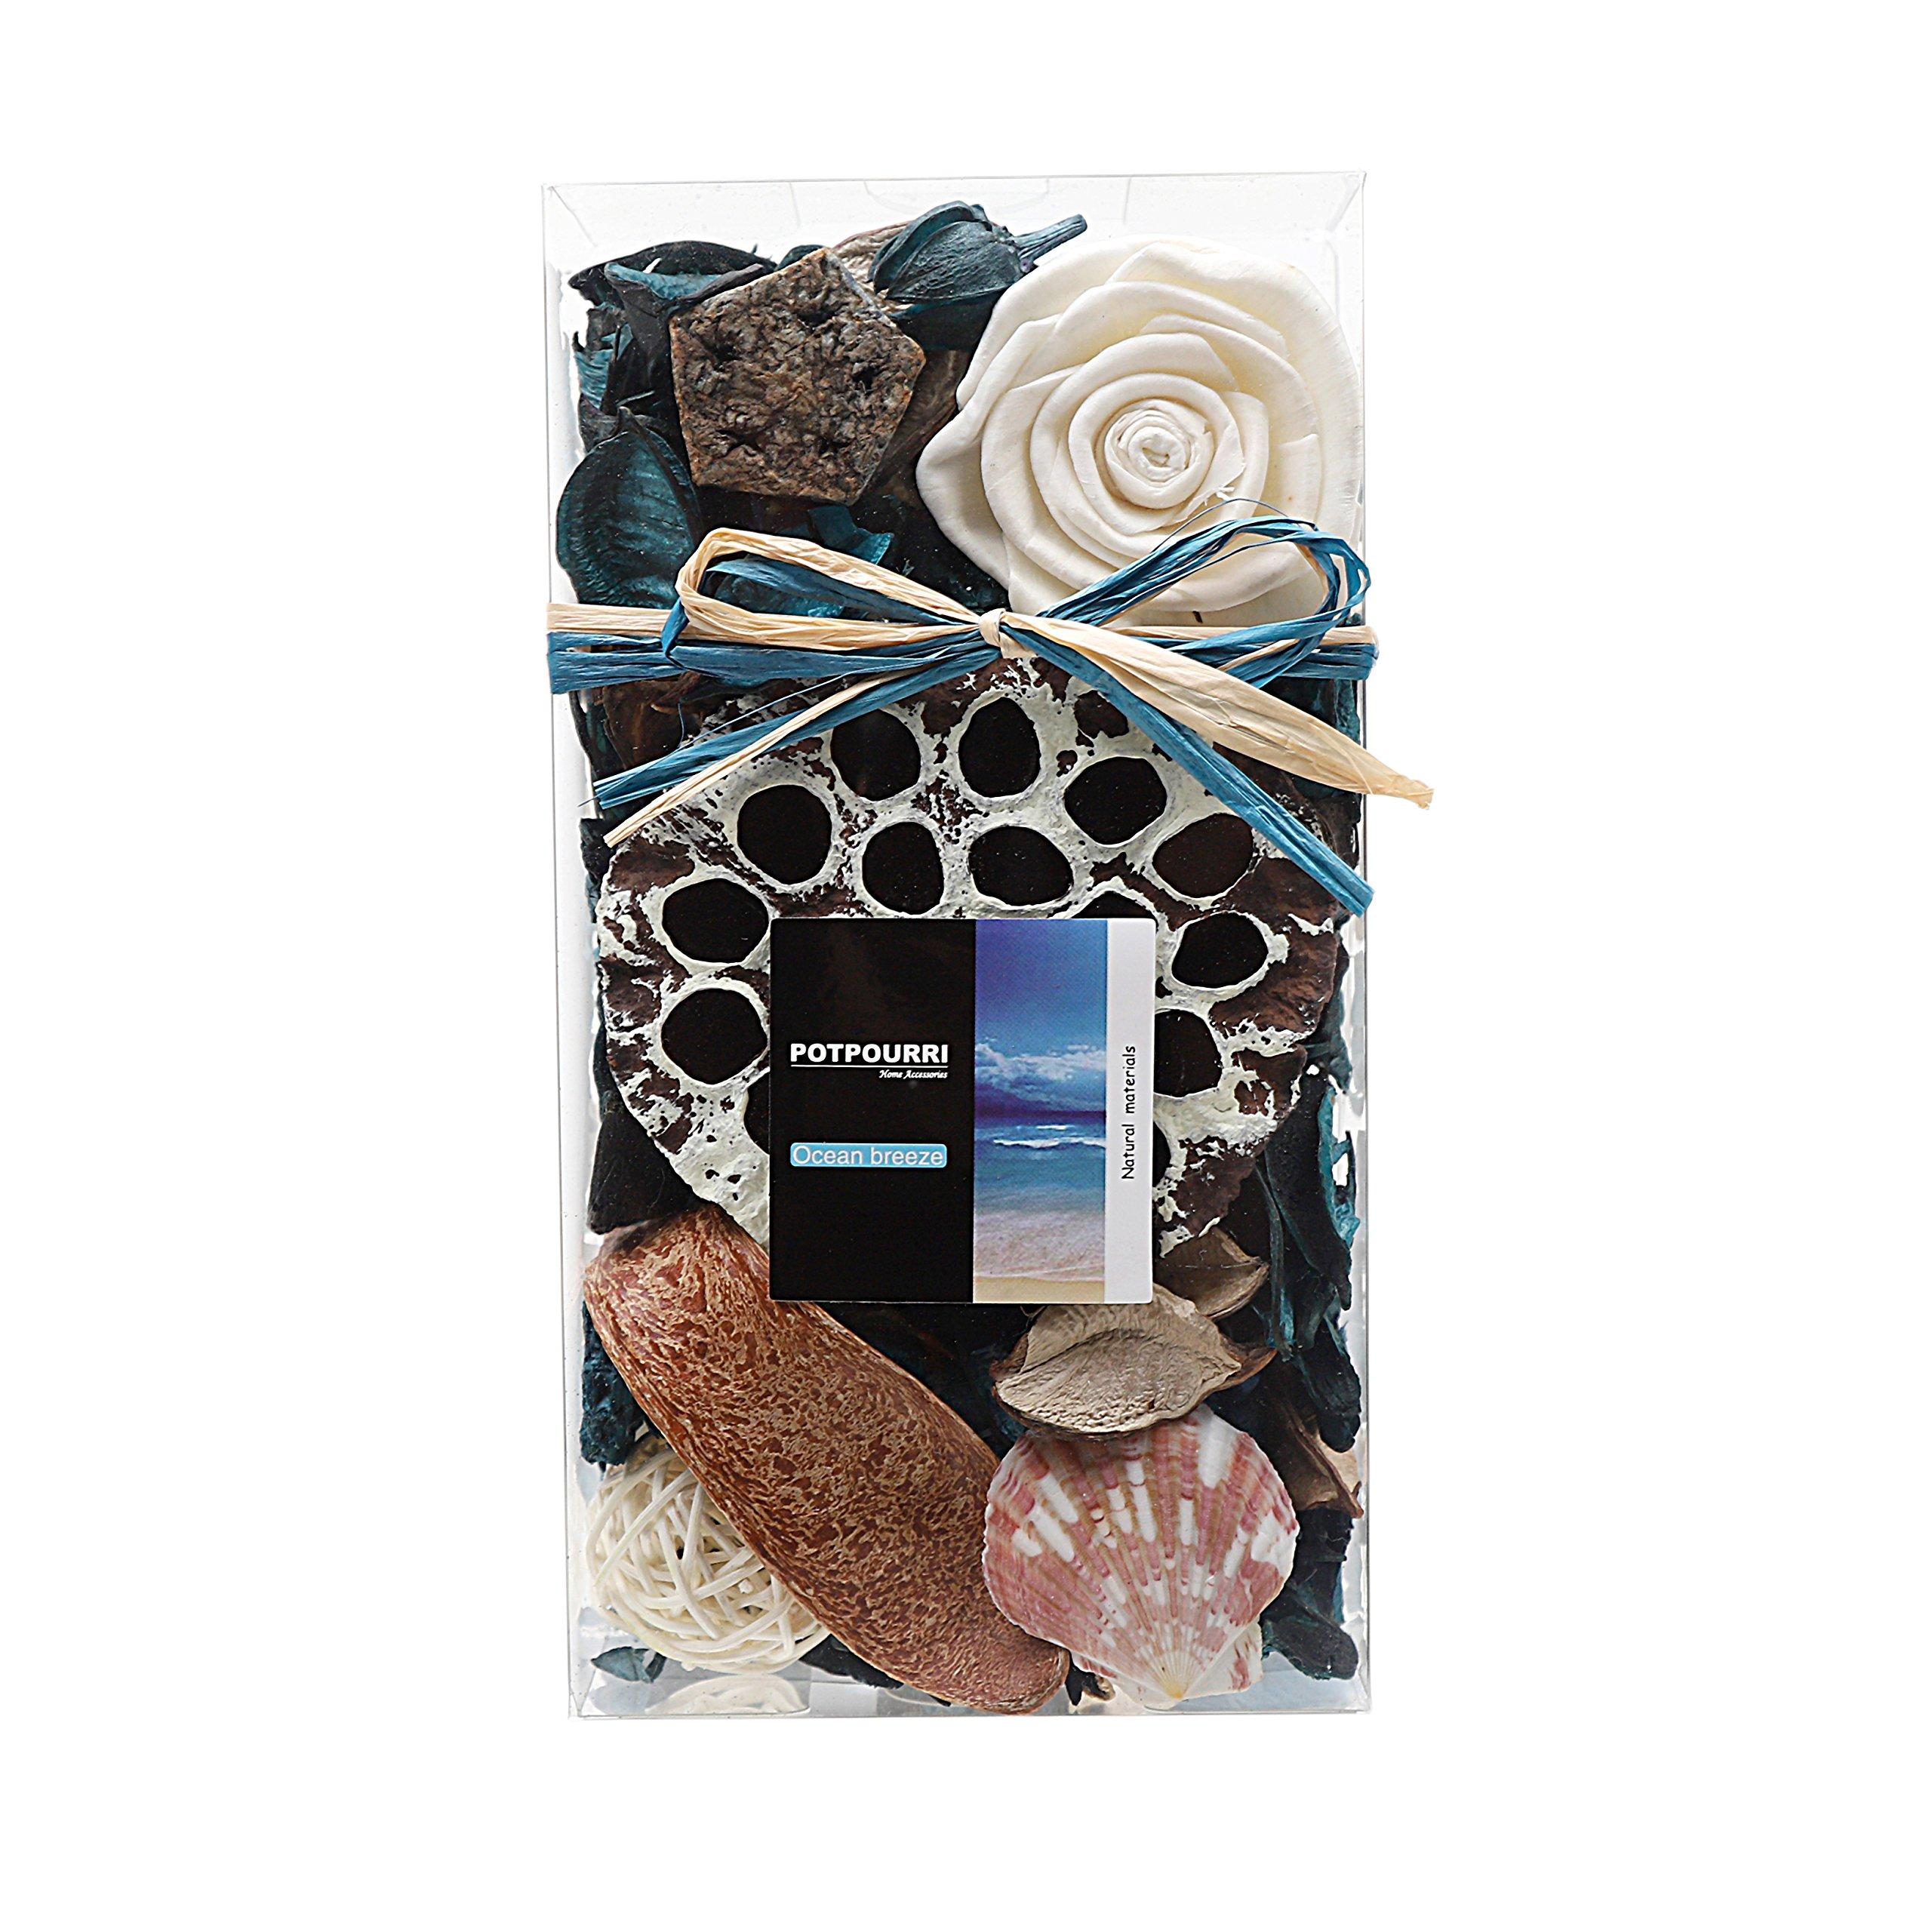 Qingbei Rina Gifts,Turquoise Potpourri Bag,Including Lotus pod,Flower,Petal,Pinone,Rattan Ball,Sepa Takraw,Perfume Satchet in PVC Bags.Home Decoration.7oz. (Turquoise)